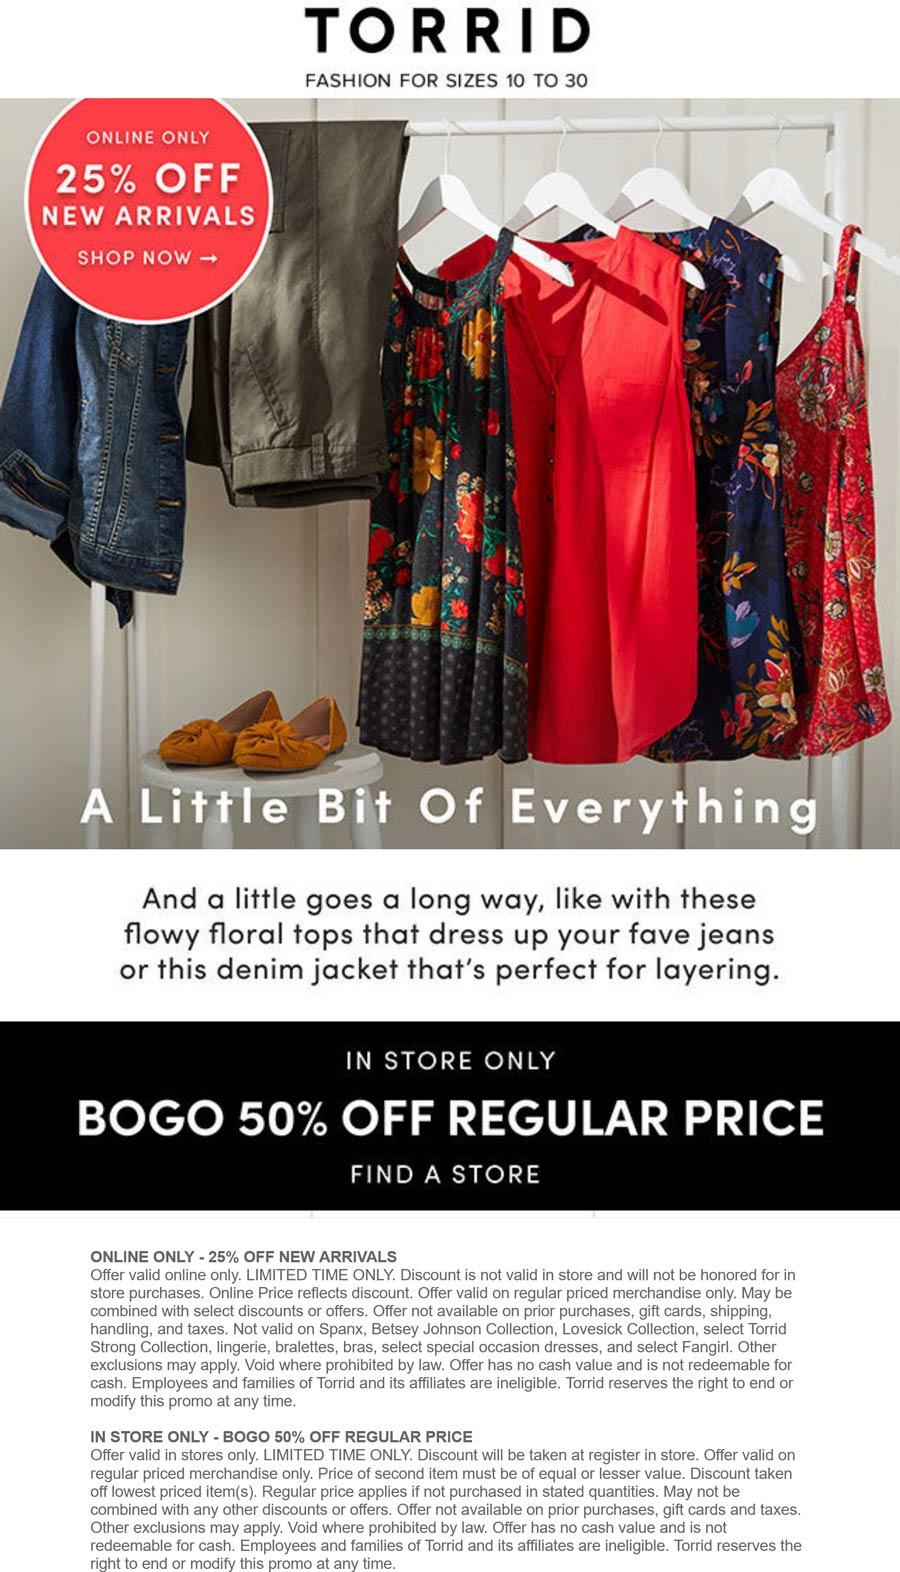 Torrid stores Coupon  Second item 50% off at Torrid, or 25% off new arrivals online #torrid